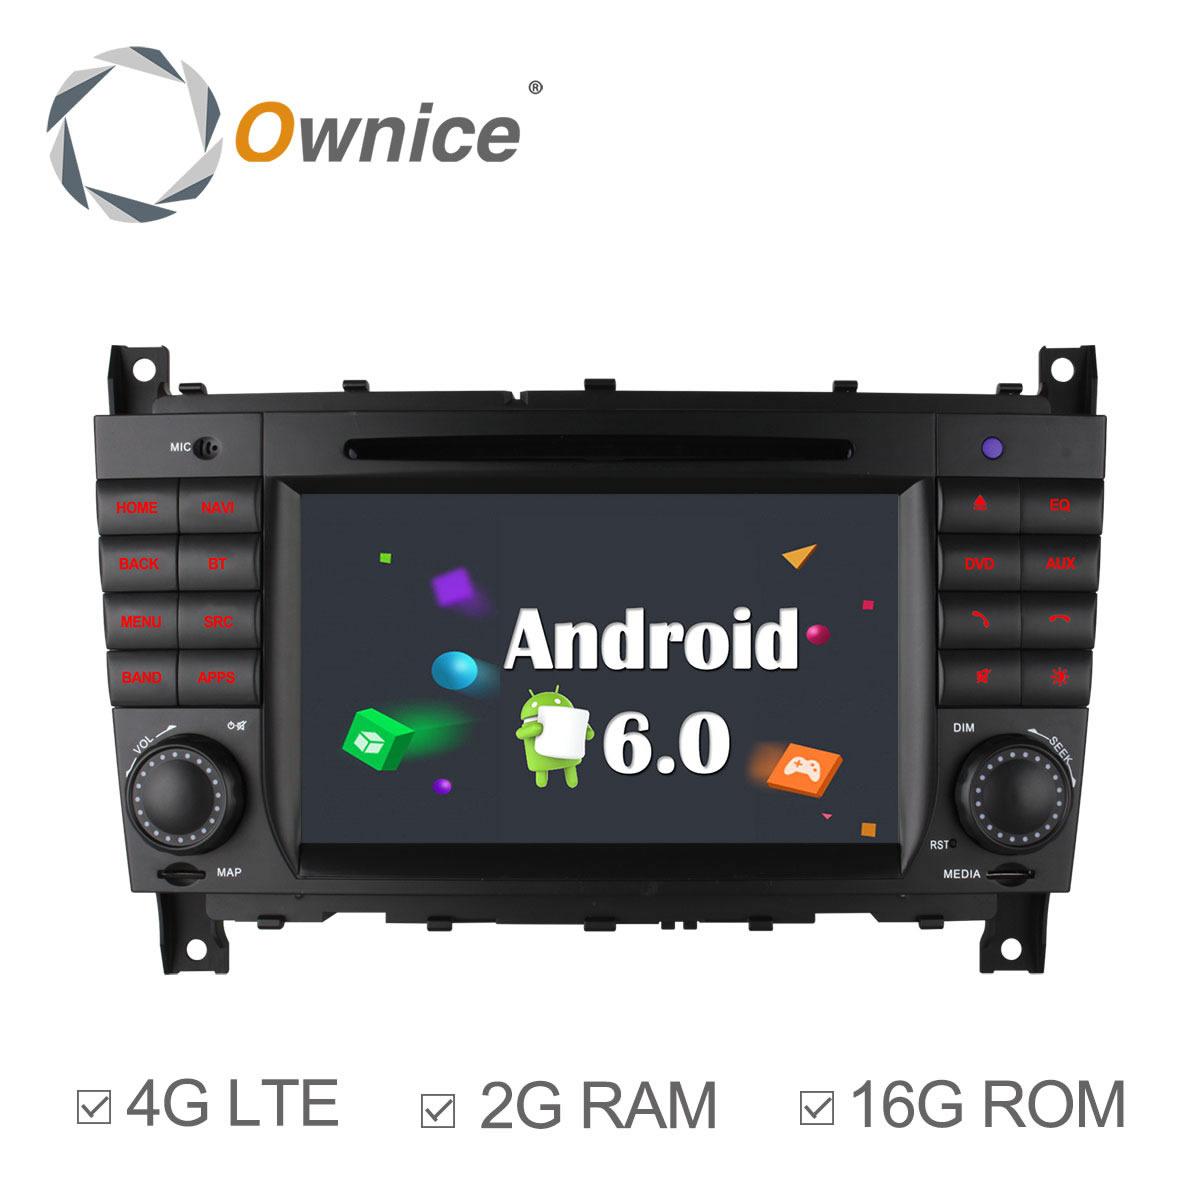 4G SIM LTE 1024X600 Quad Core Android 6.0 Car DVD Player for Mercedes C CLS CLC CLK Class W203 W209 W219 GPS Navigation Radio